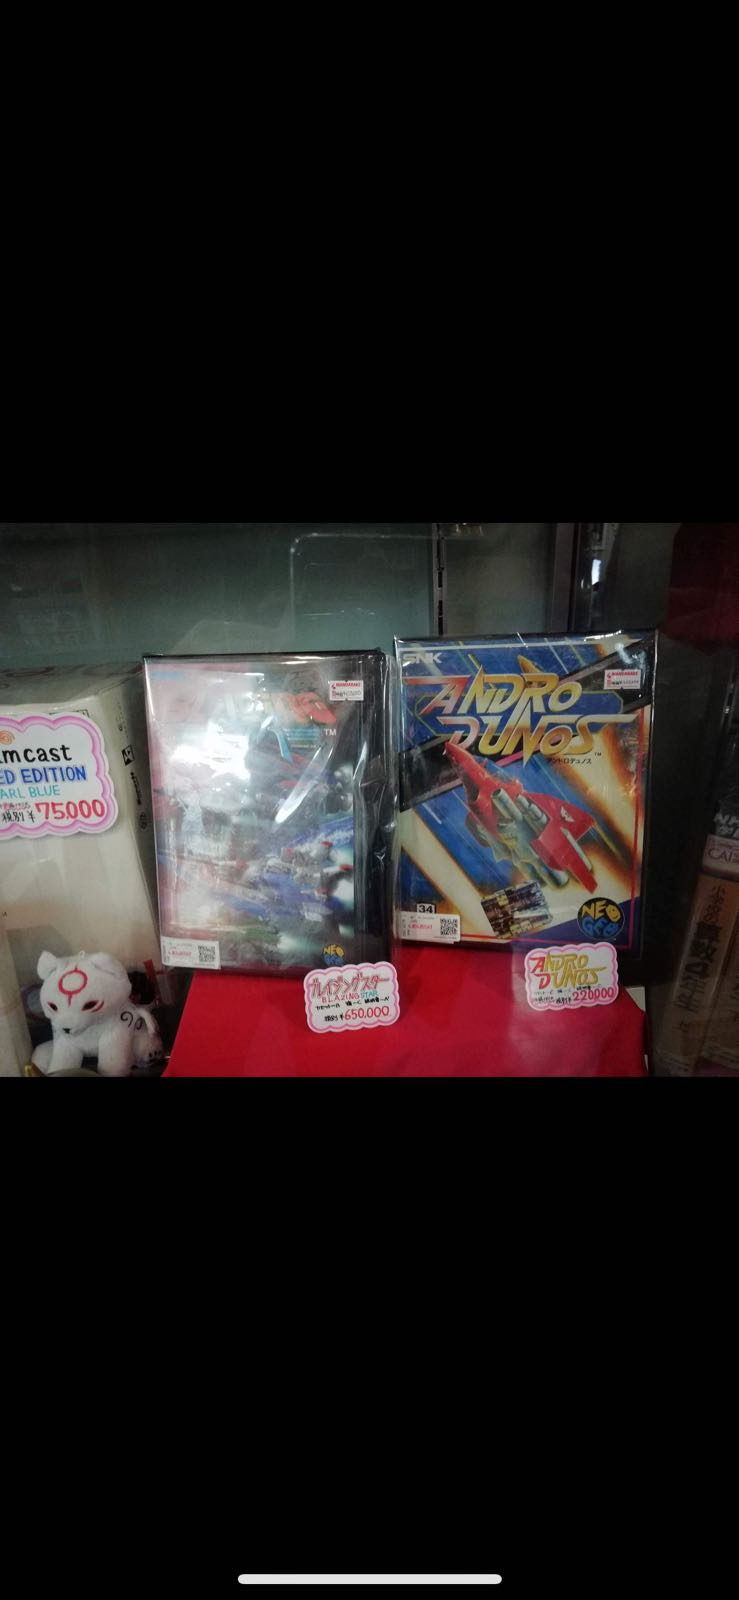 Tarifs - Jeux NEO GEO - Akihabara juin 2017 - Page 5 Img_2110